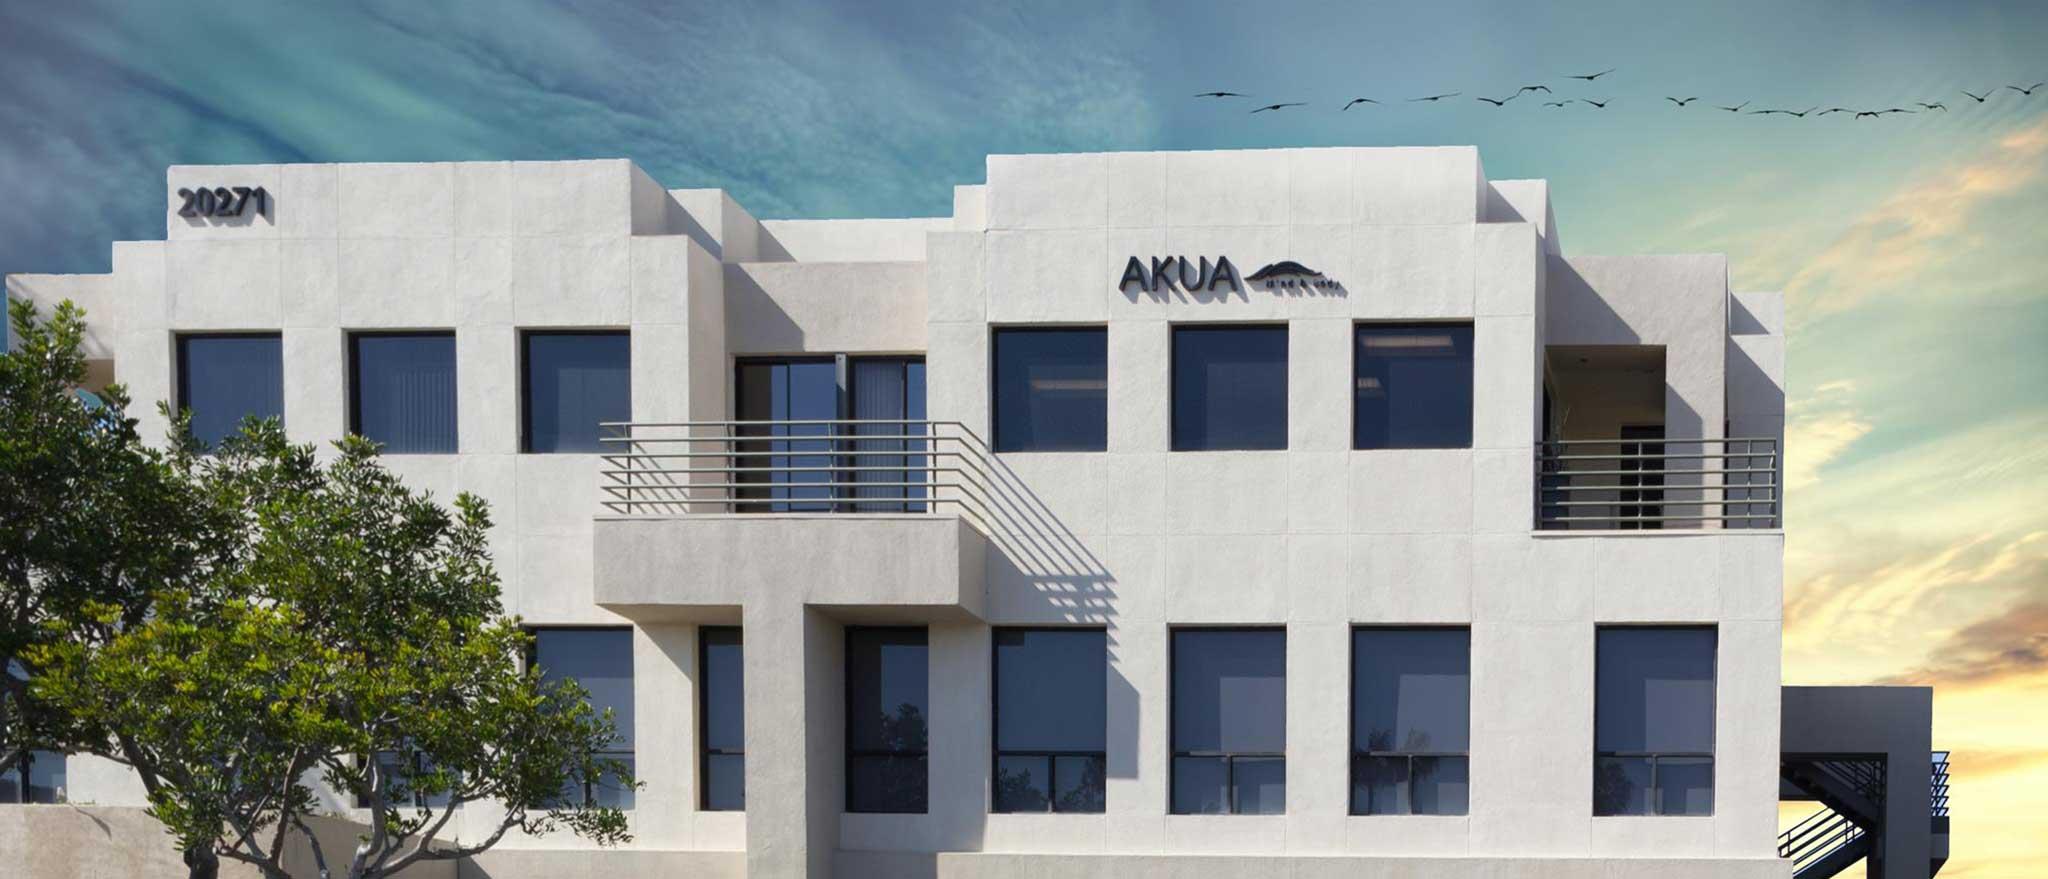 AKUA Building